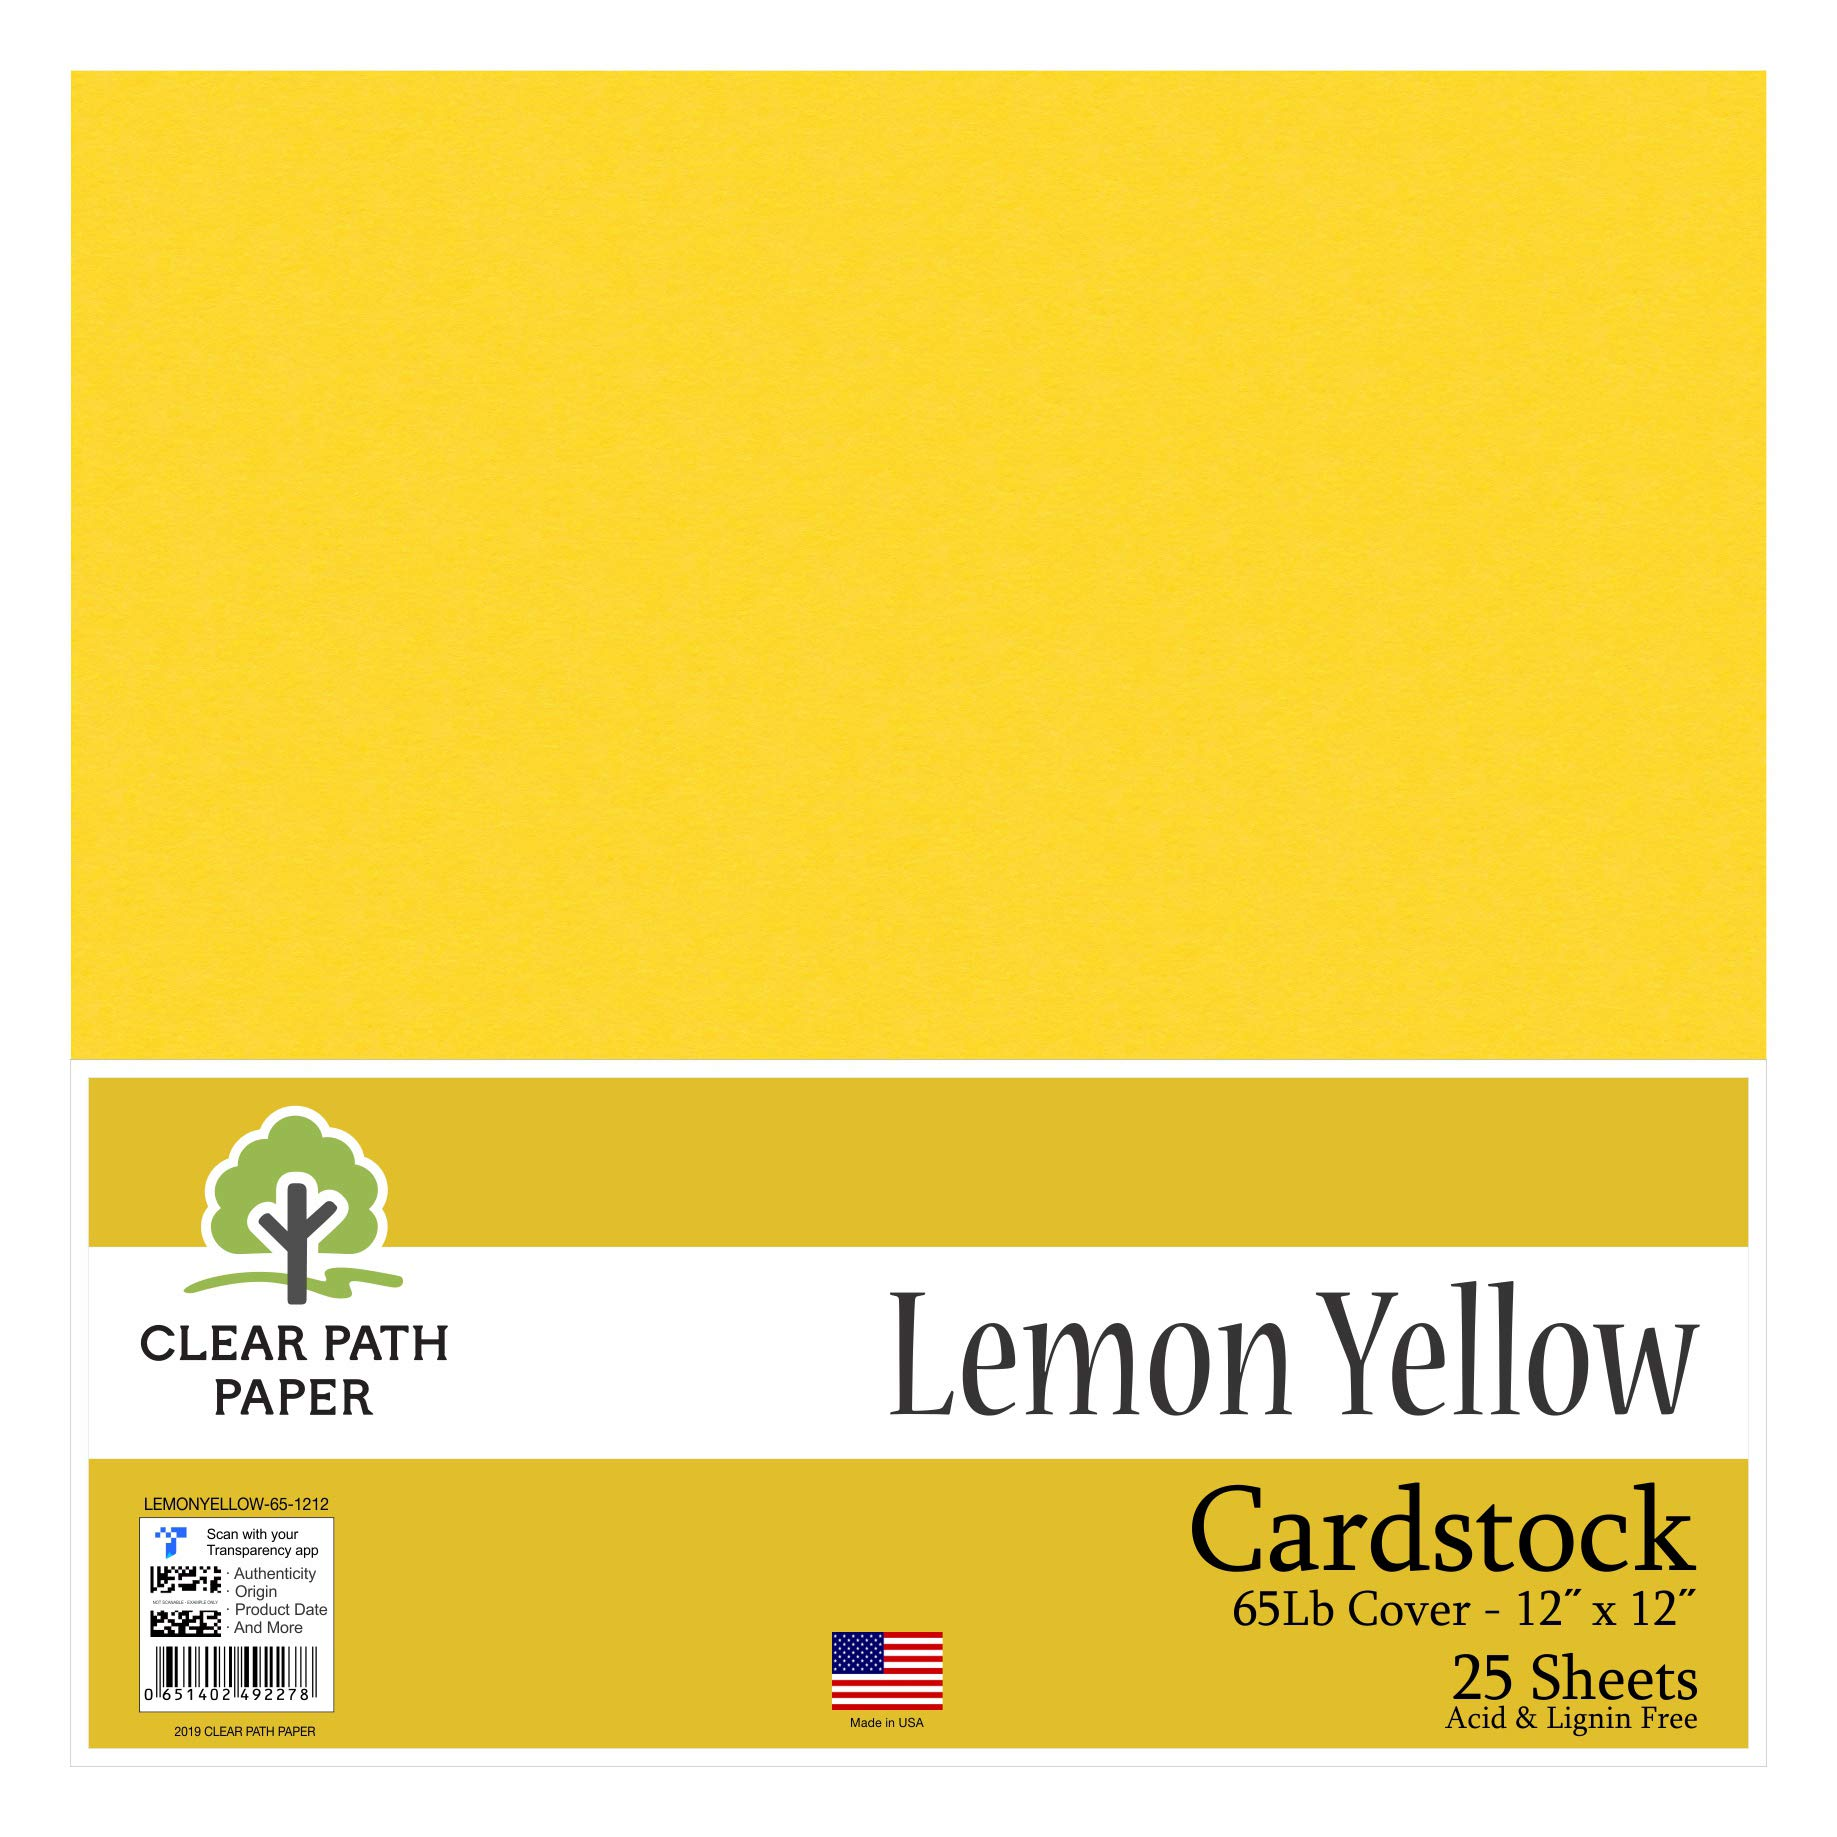 Lemon Yellow Cardstock - 5 x 5 inch - 5Lb Cover 5 x 5 Inch